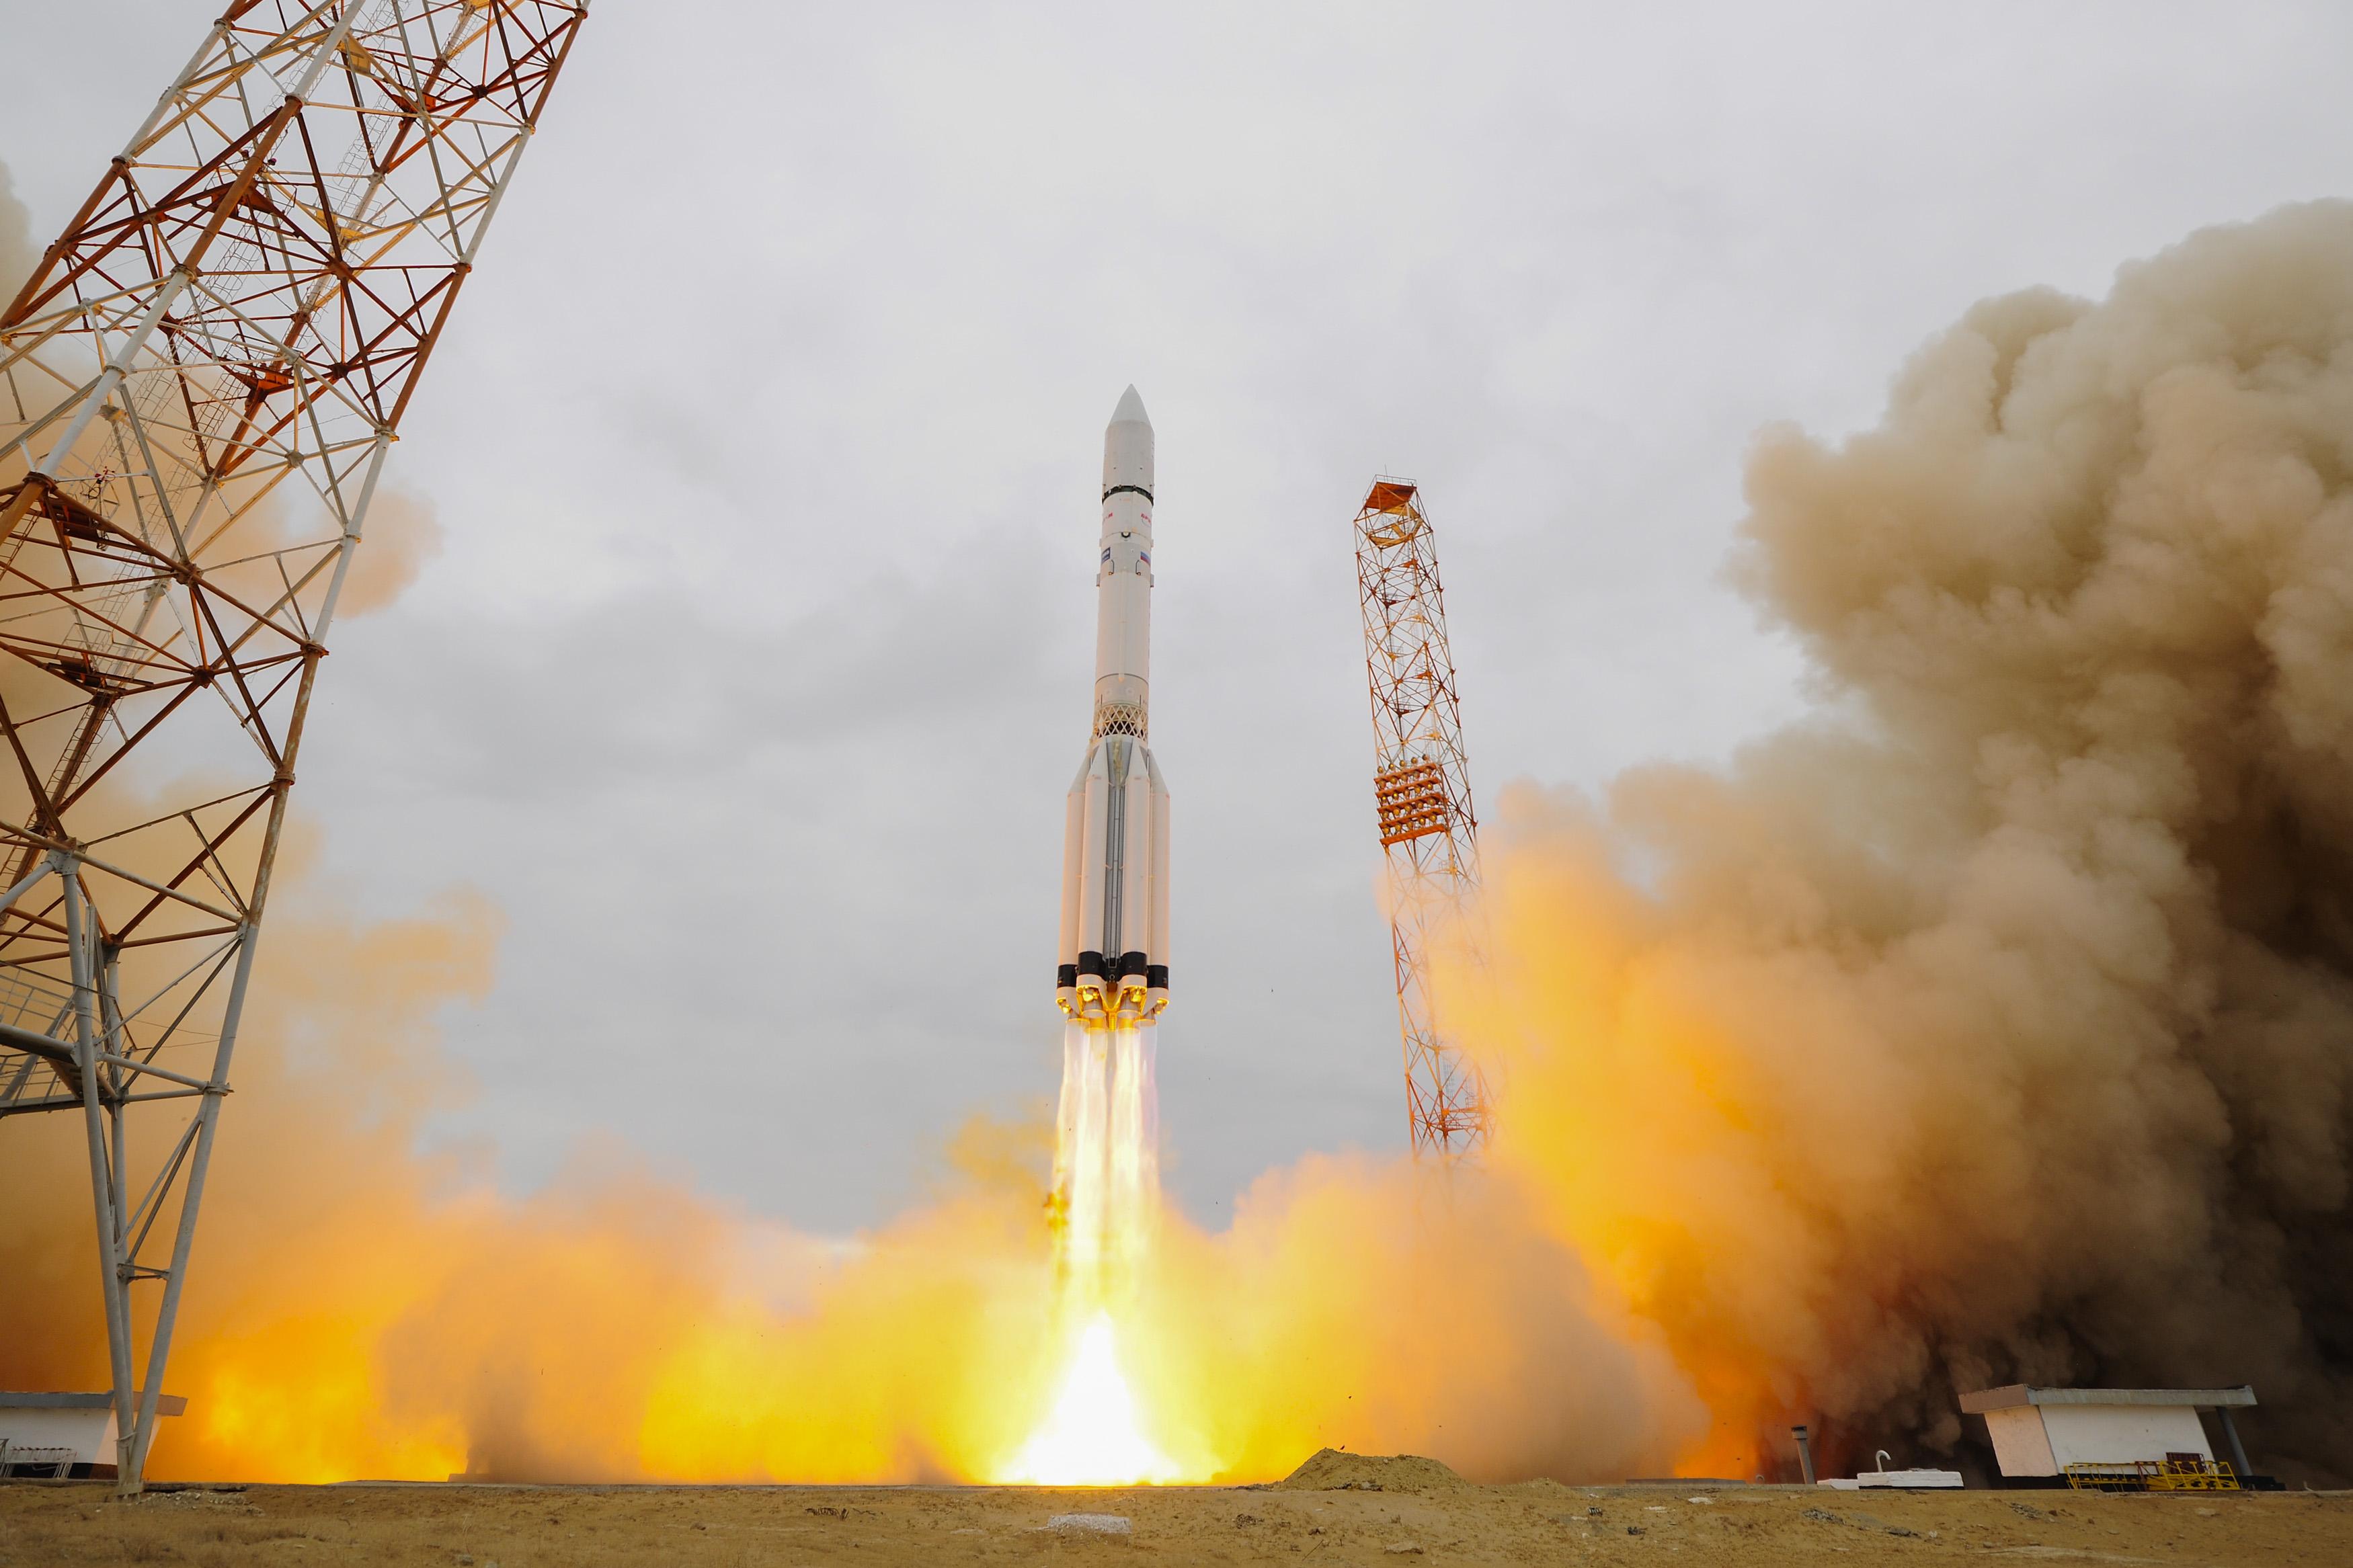 future rocket taking off - HD1600×915